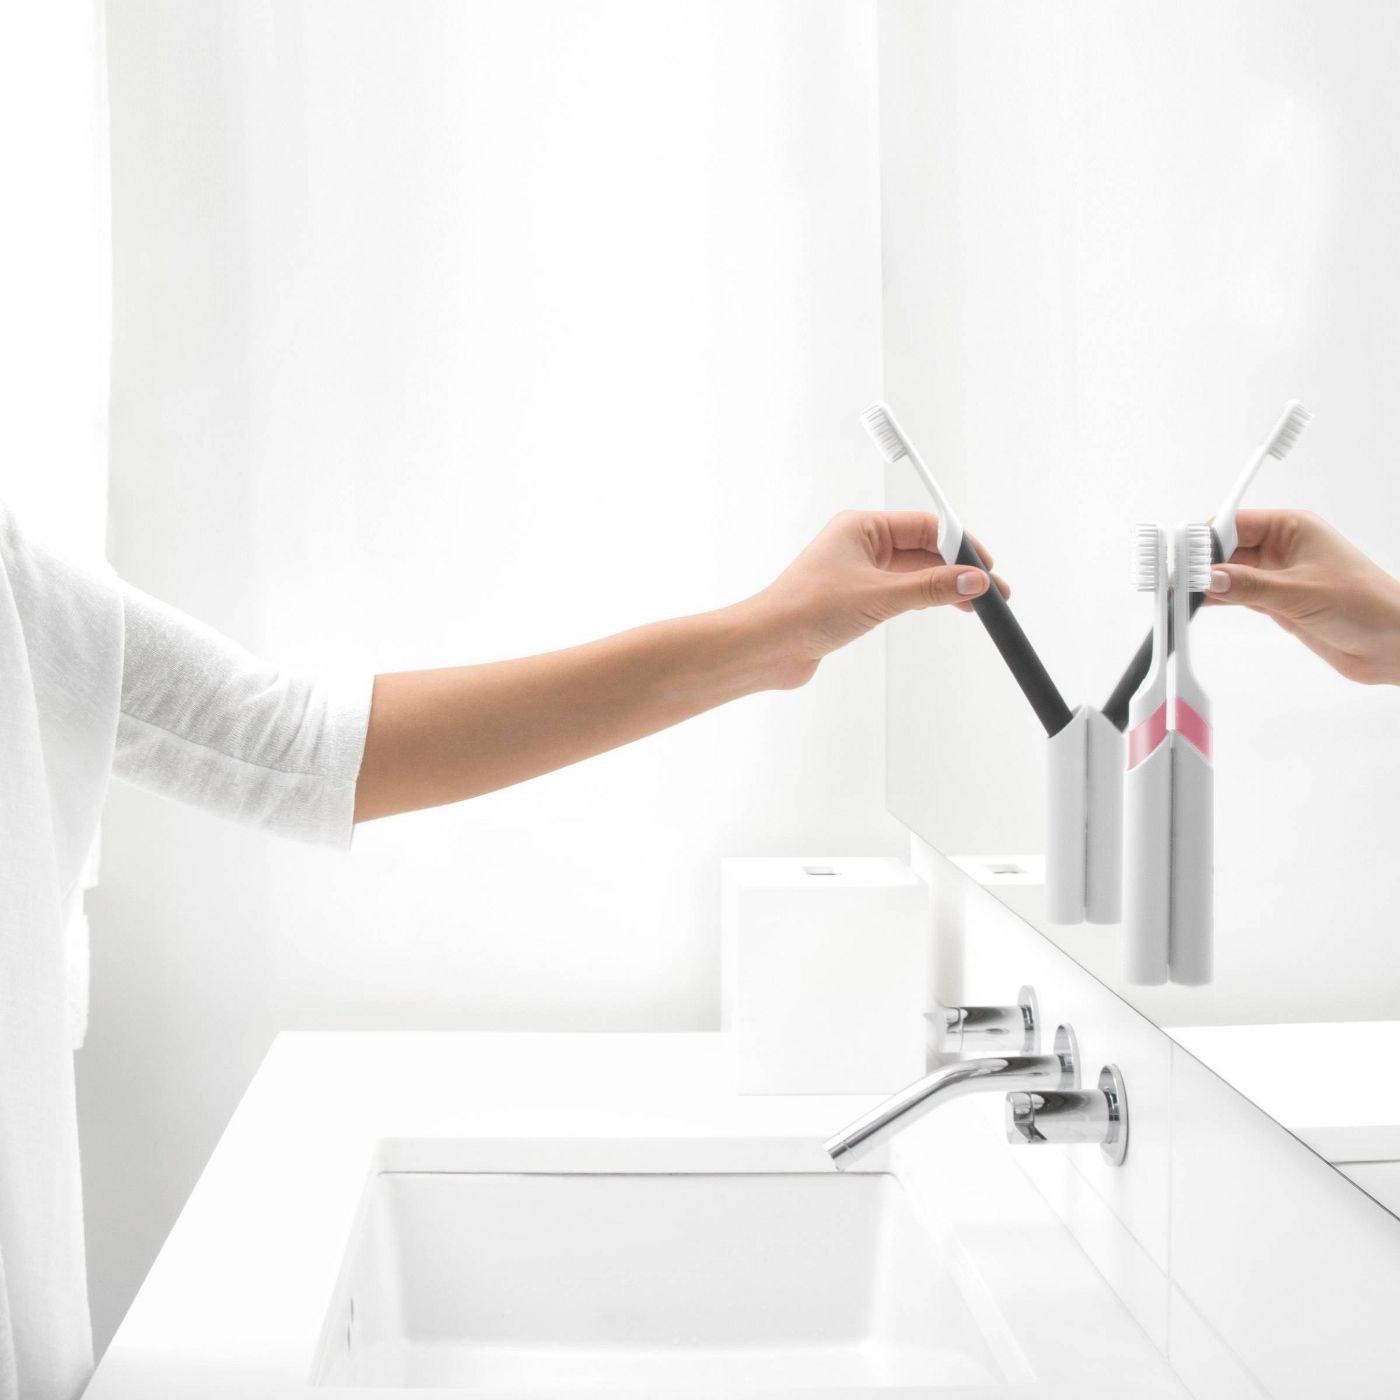 Model putting toothbrush away in bathroom